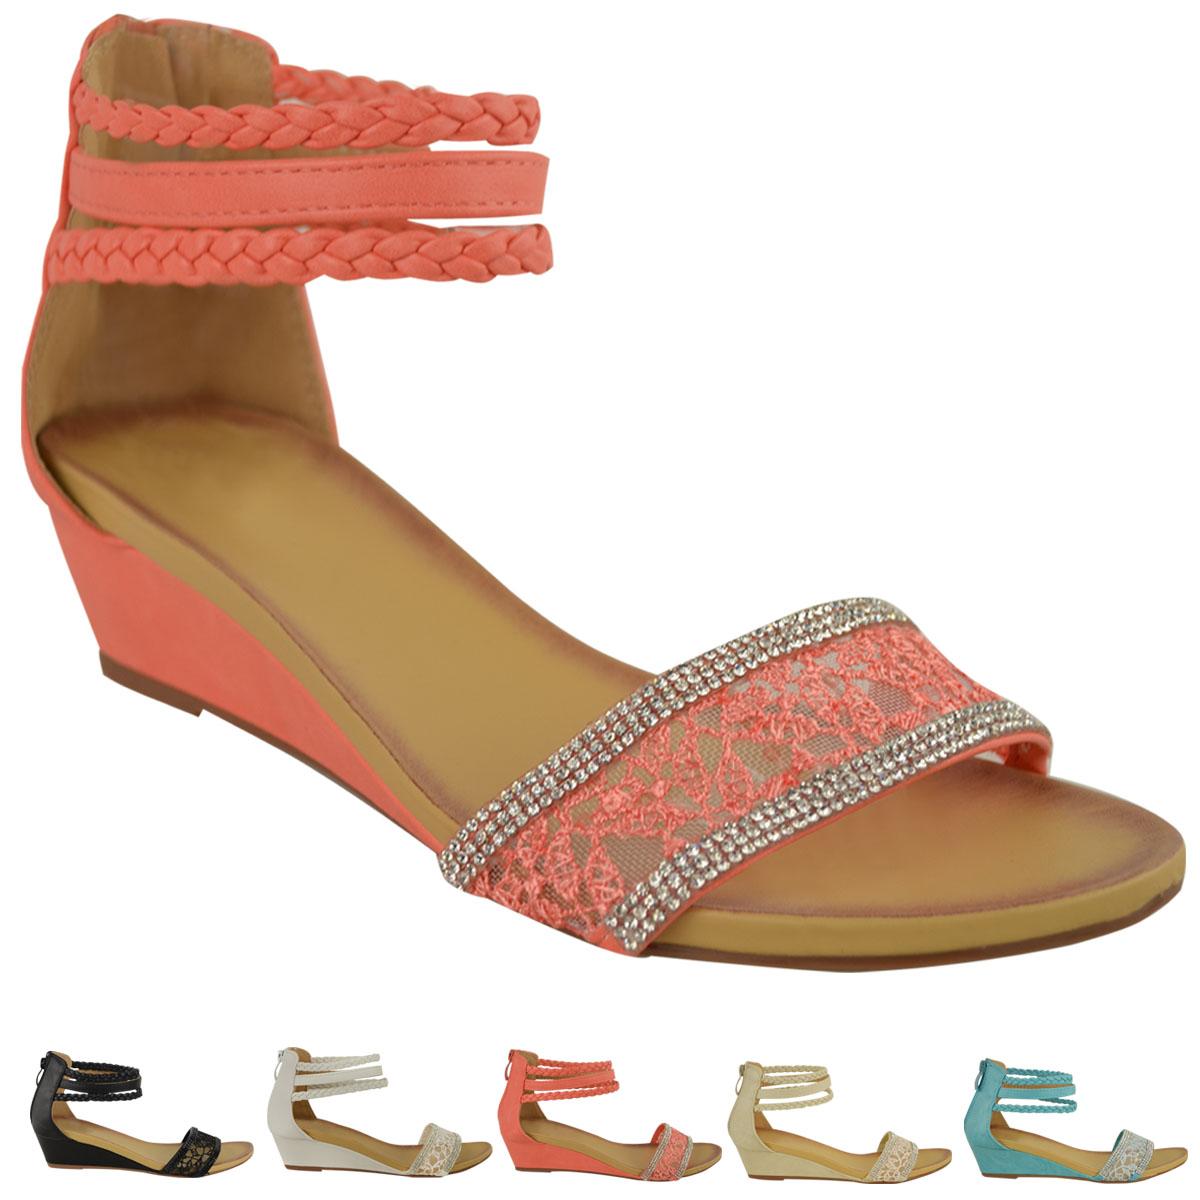 damen sommer sandalen niedrige abs tze keilabsatz kn chel riemchen spitze strass ebay. Black Bedroom Furniture Sets. Home Design Ideas